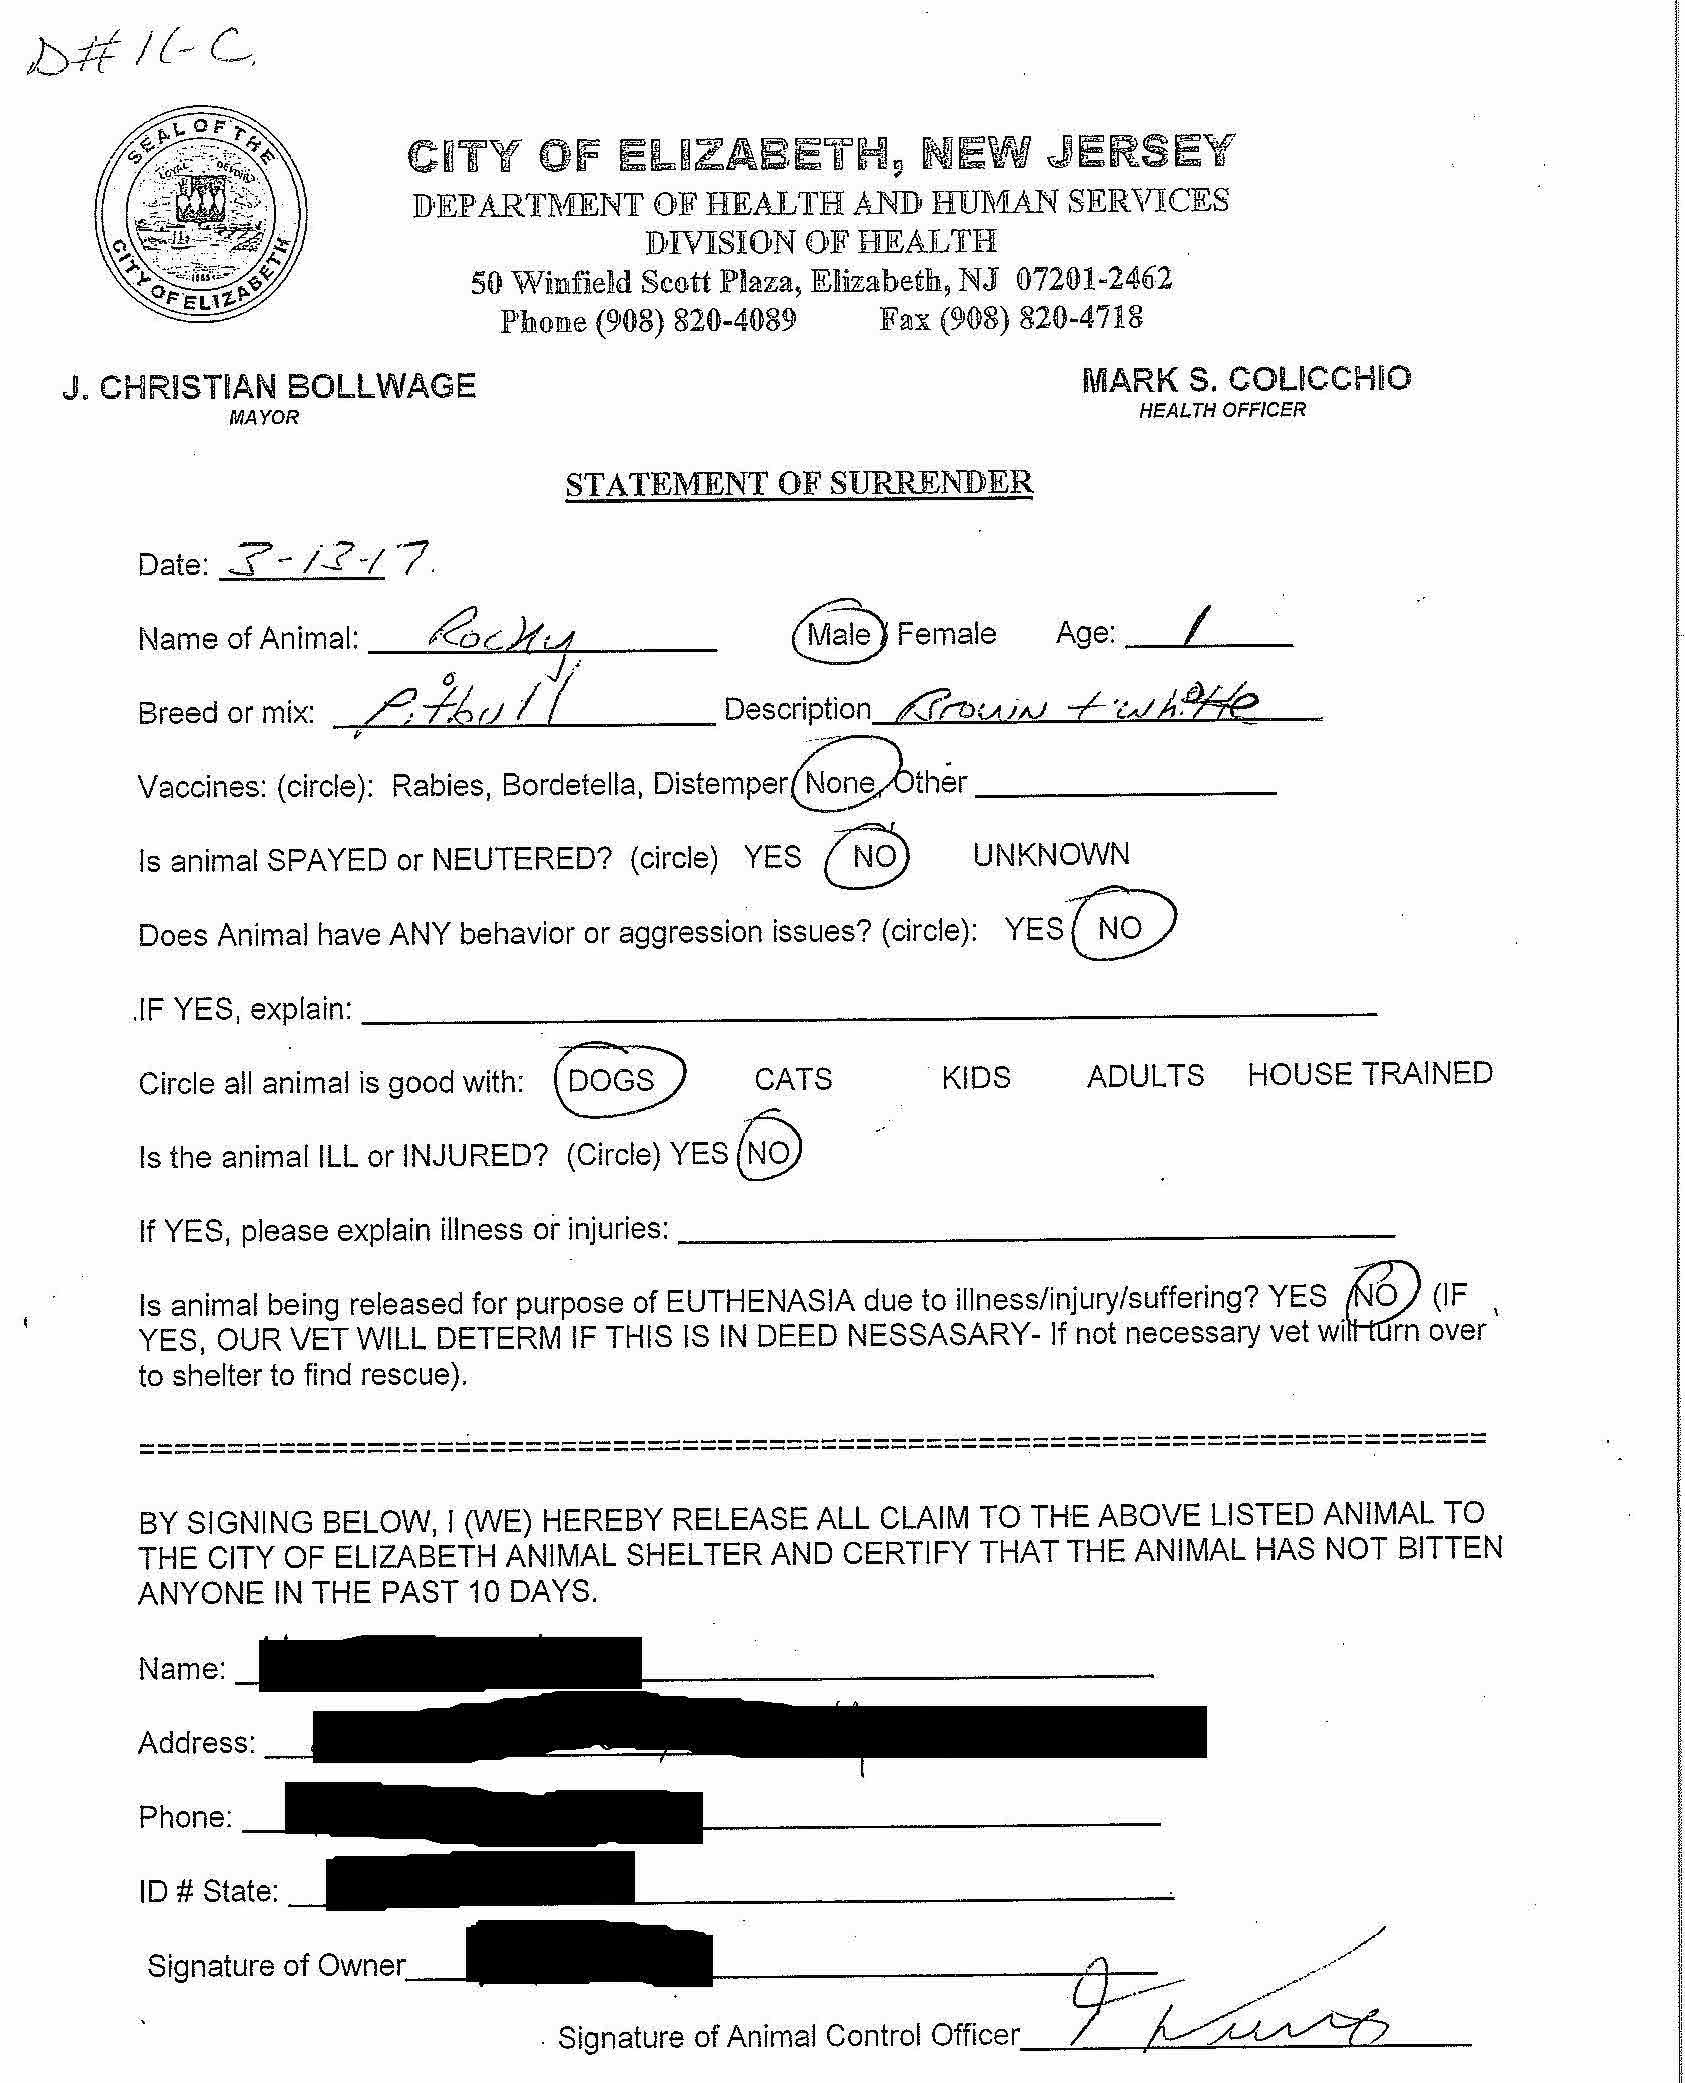 Dog ID 11-C Elizabeth Surrender Form.jpg